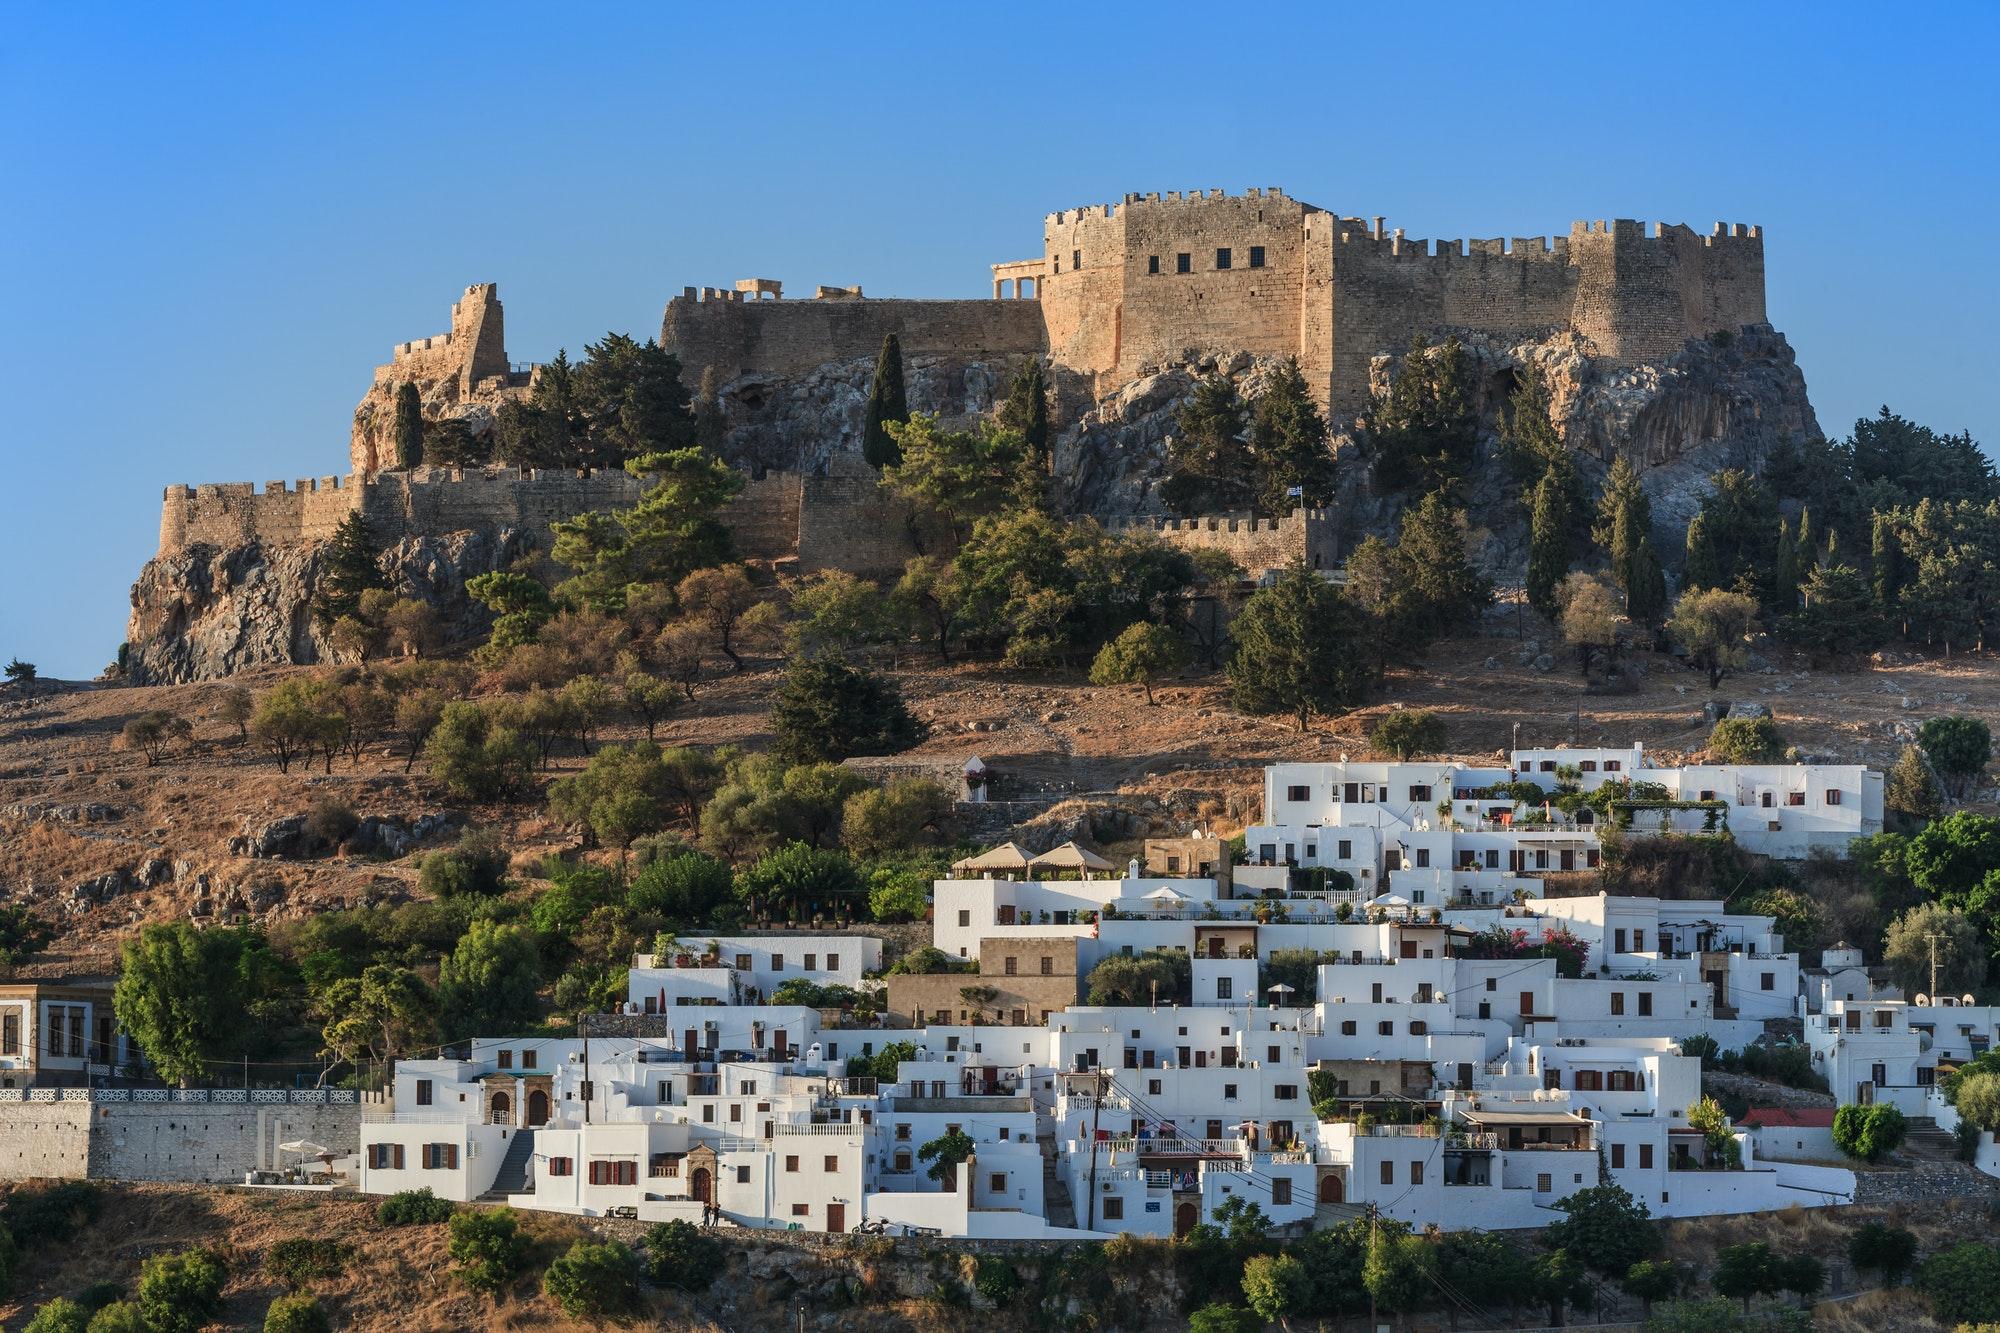 Lindos Castle and village